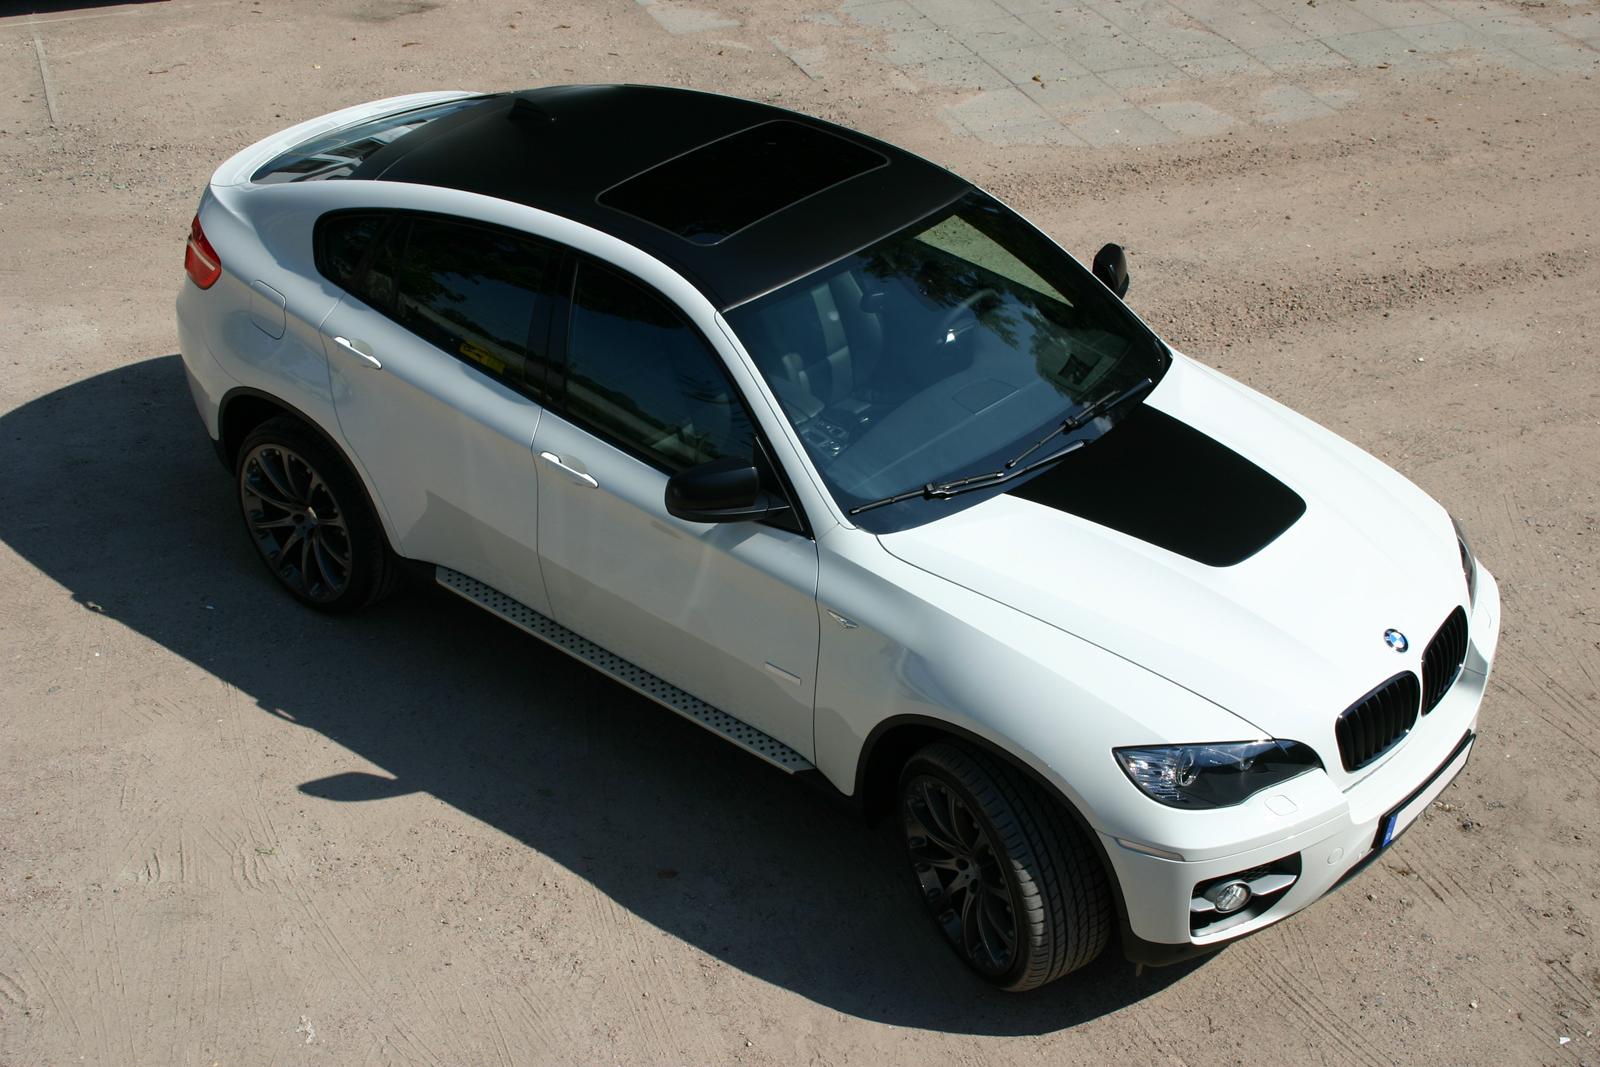 BMW_X6_TEILFOLIERUNG_SCHWARZ_MATT_DACH_HUTZE_03